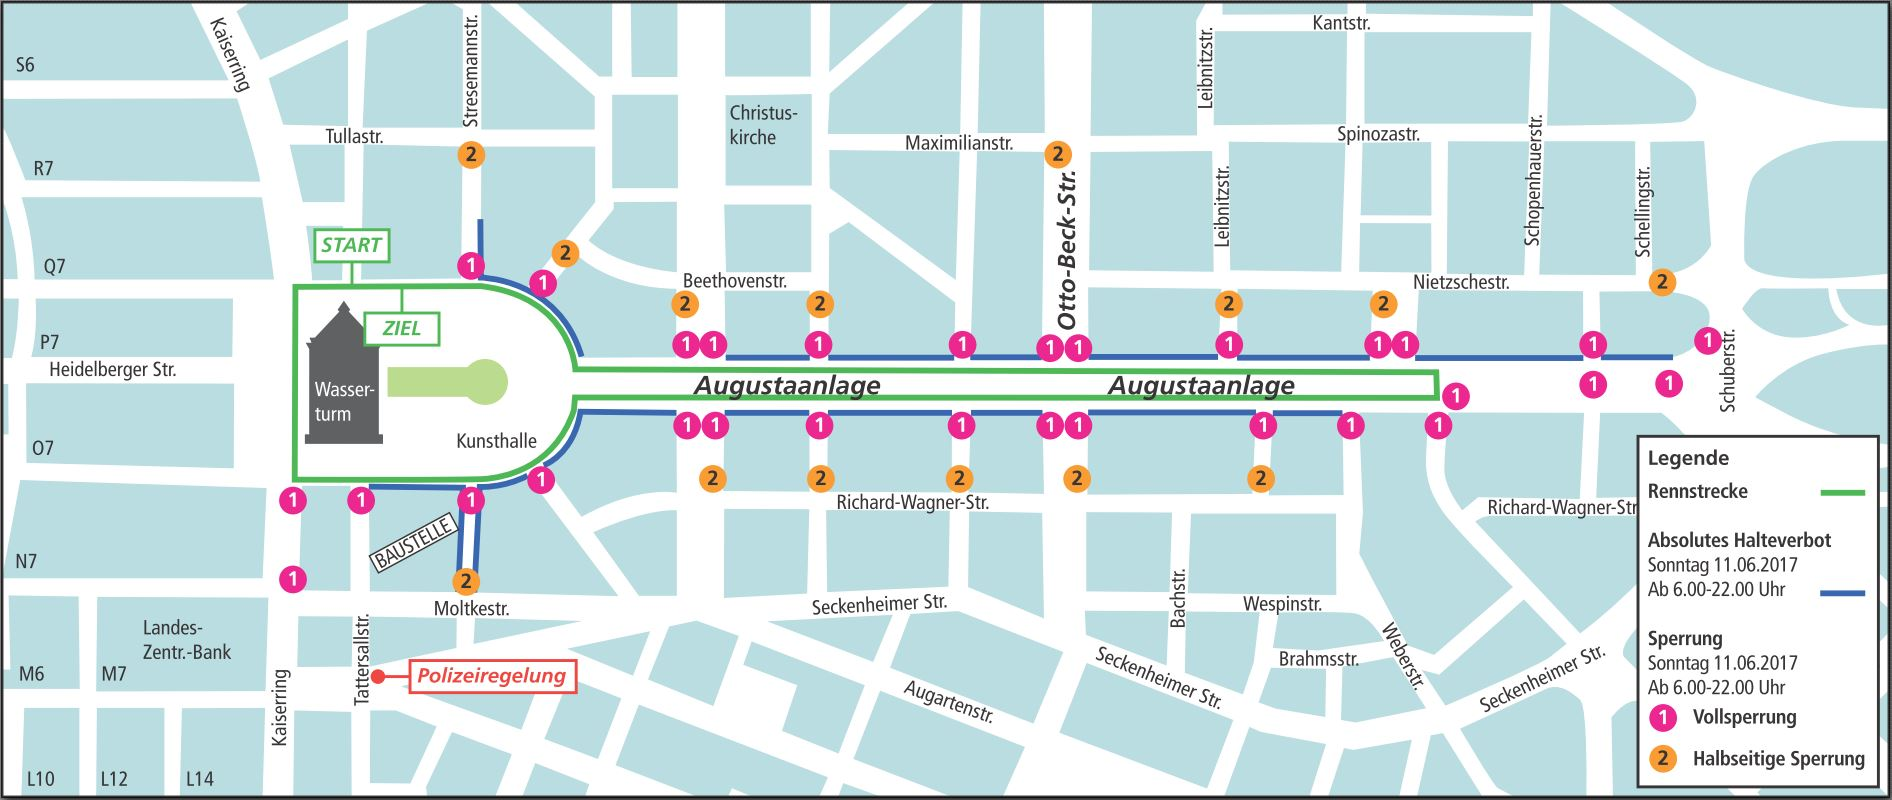 Karte_Sonntag